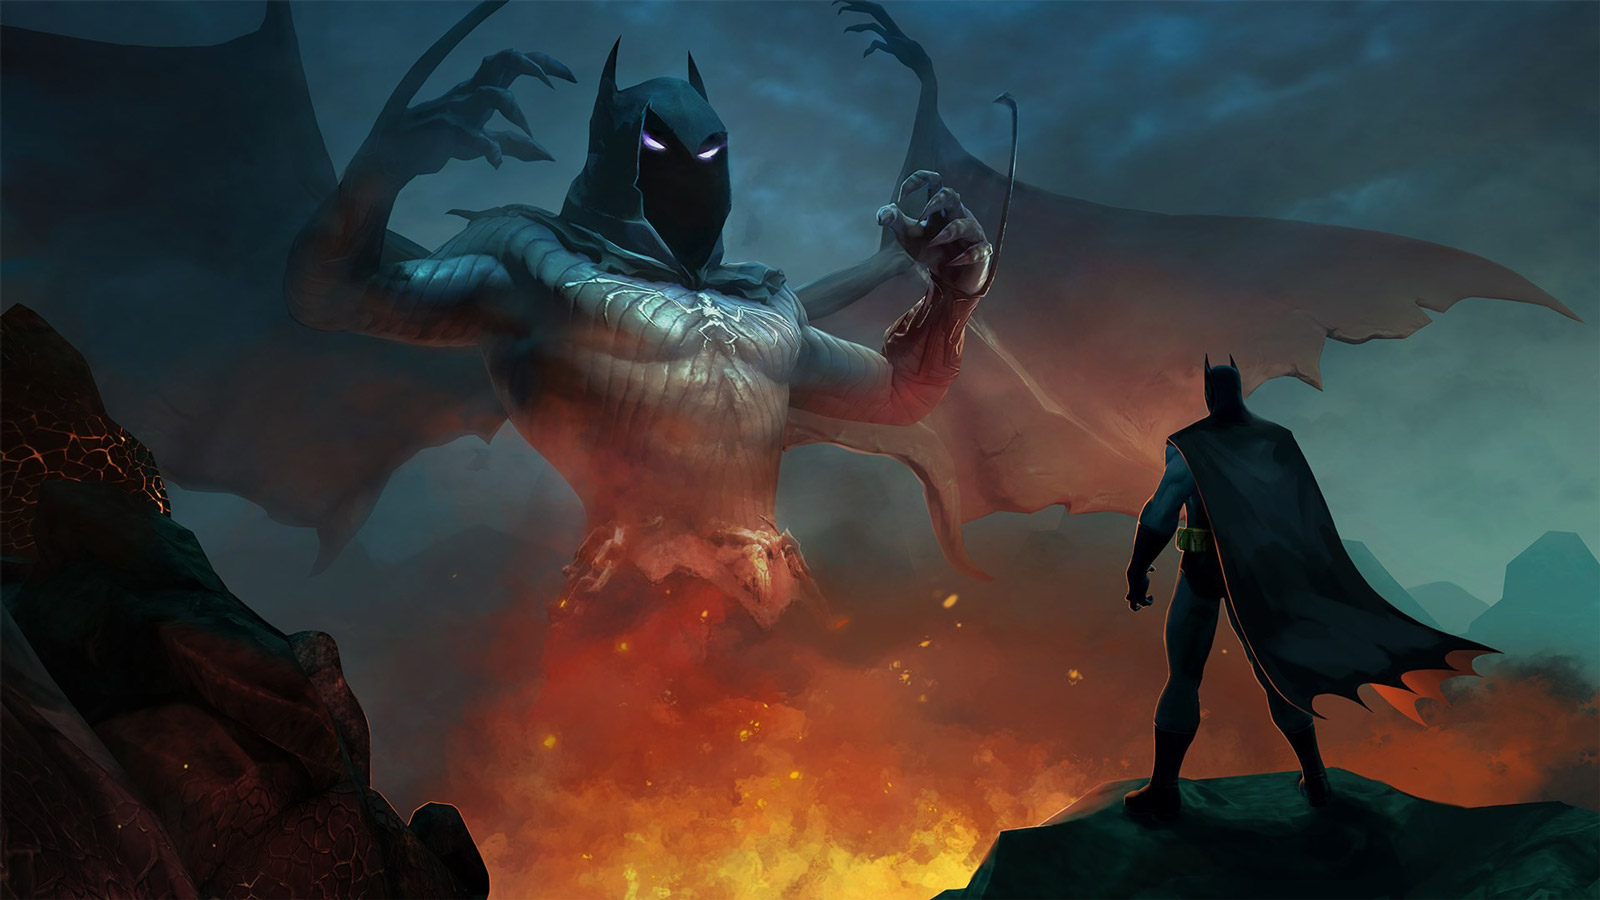 DC Universe Online Wallpaper in 1600x900